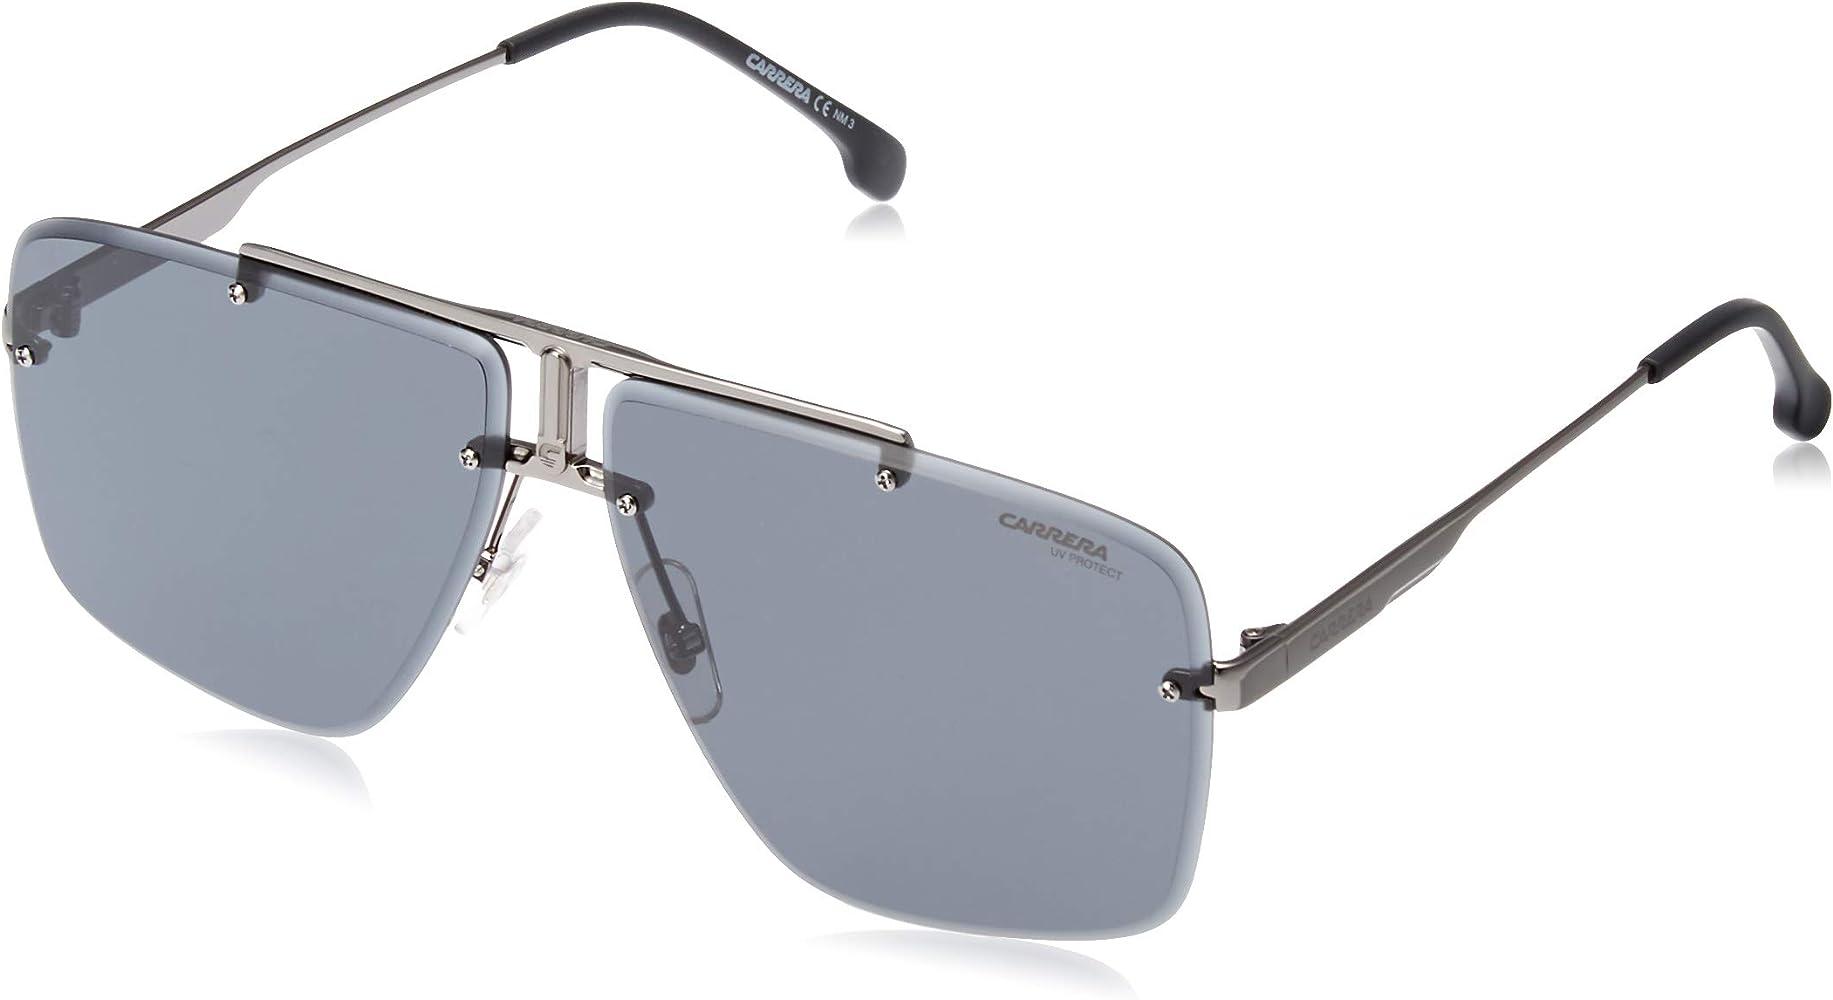 Carrera Gafas Unisex Adulto